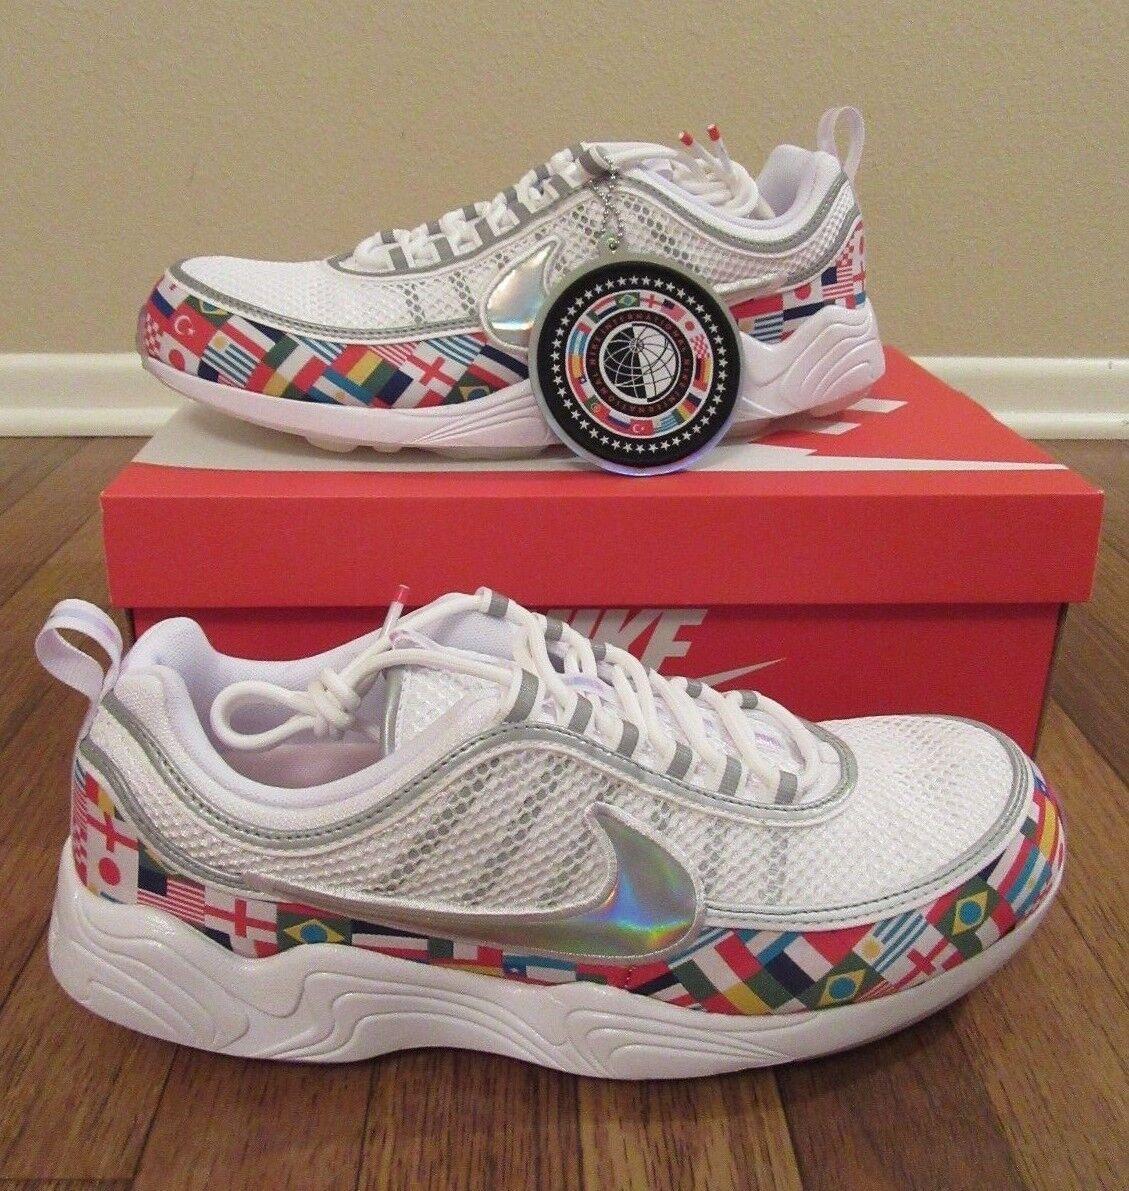 Nike air zoom spiridon 16 nic bianco qs dimensioni multi - ao5121 100 internazionali